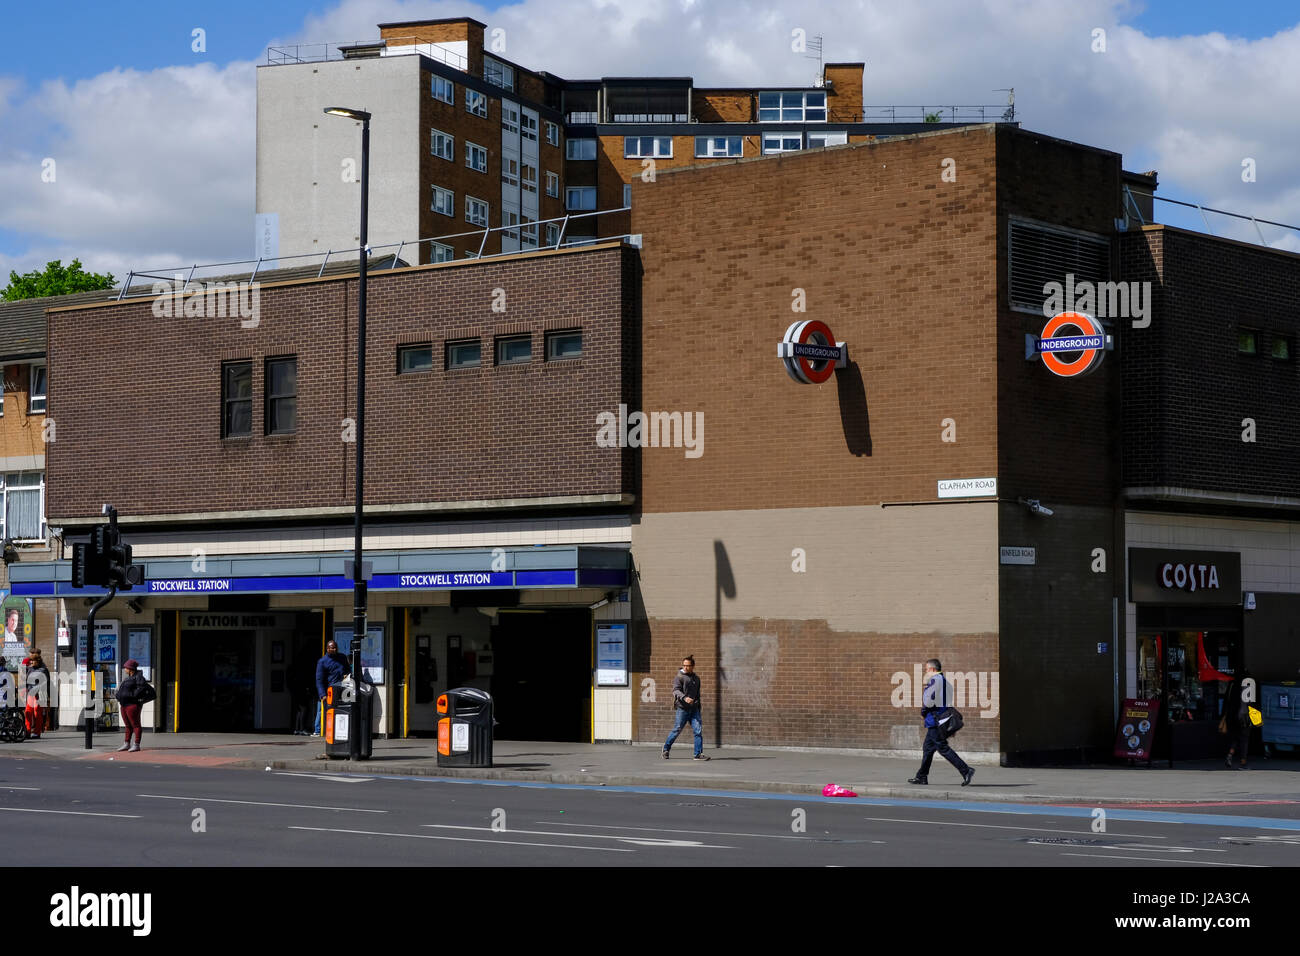 Stockwell station - Stock Image